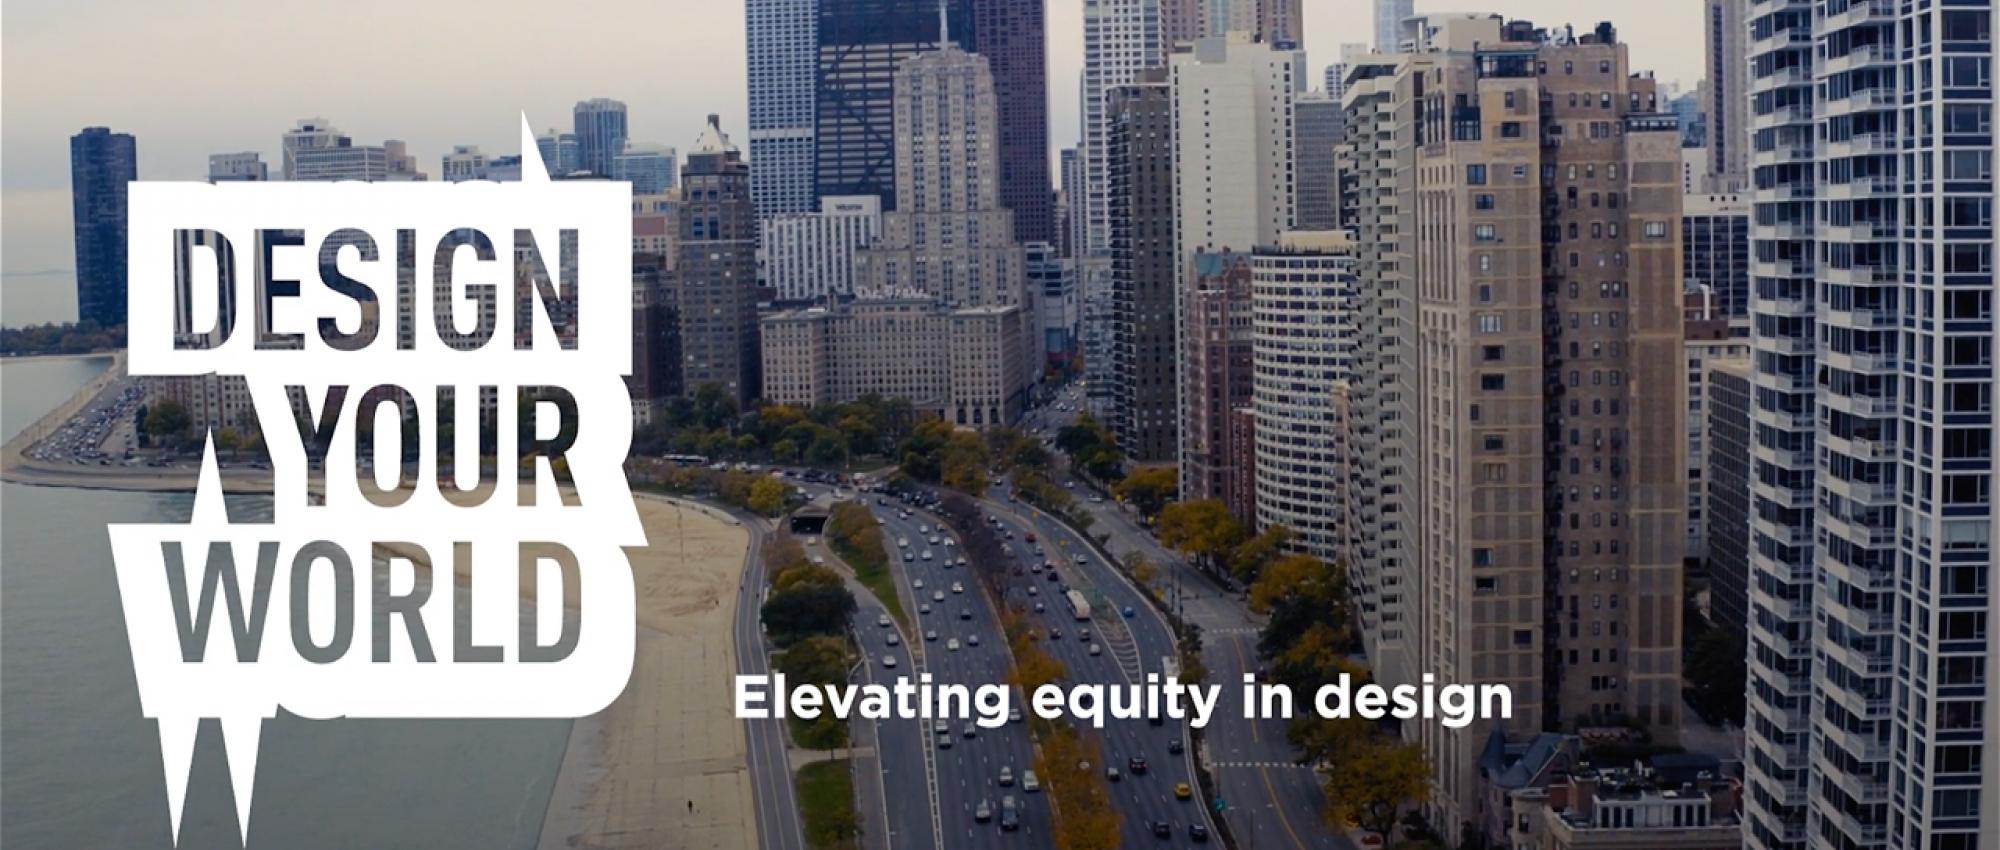 Elevating equity in design